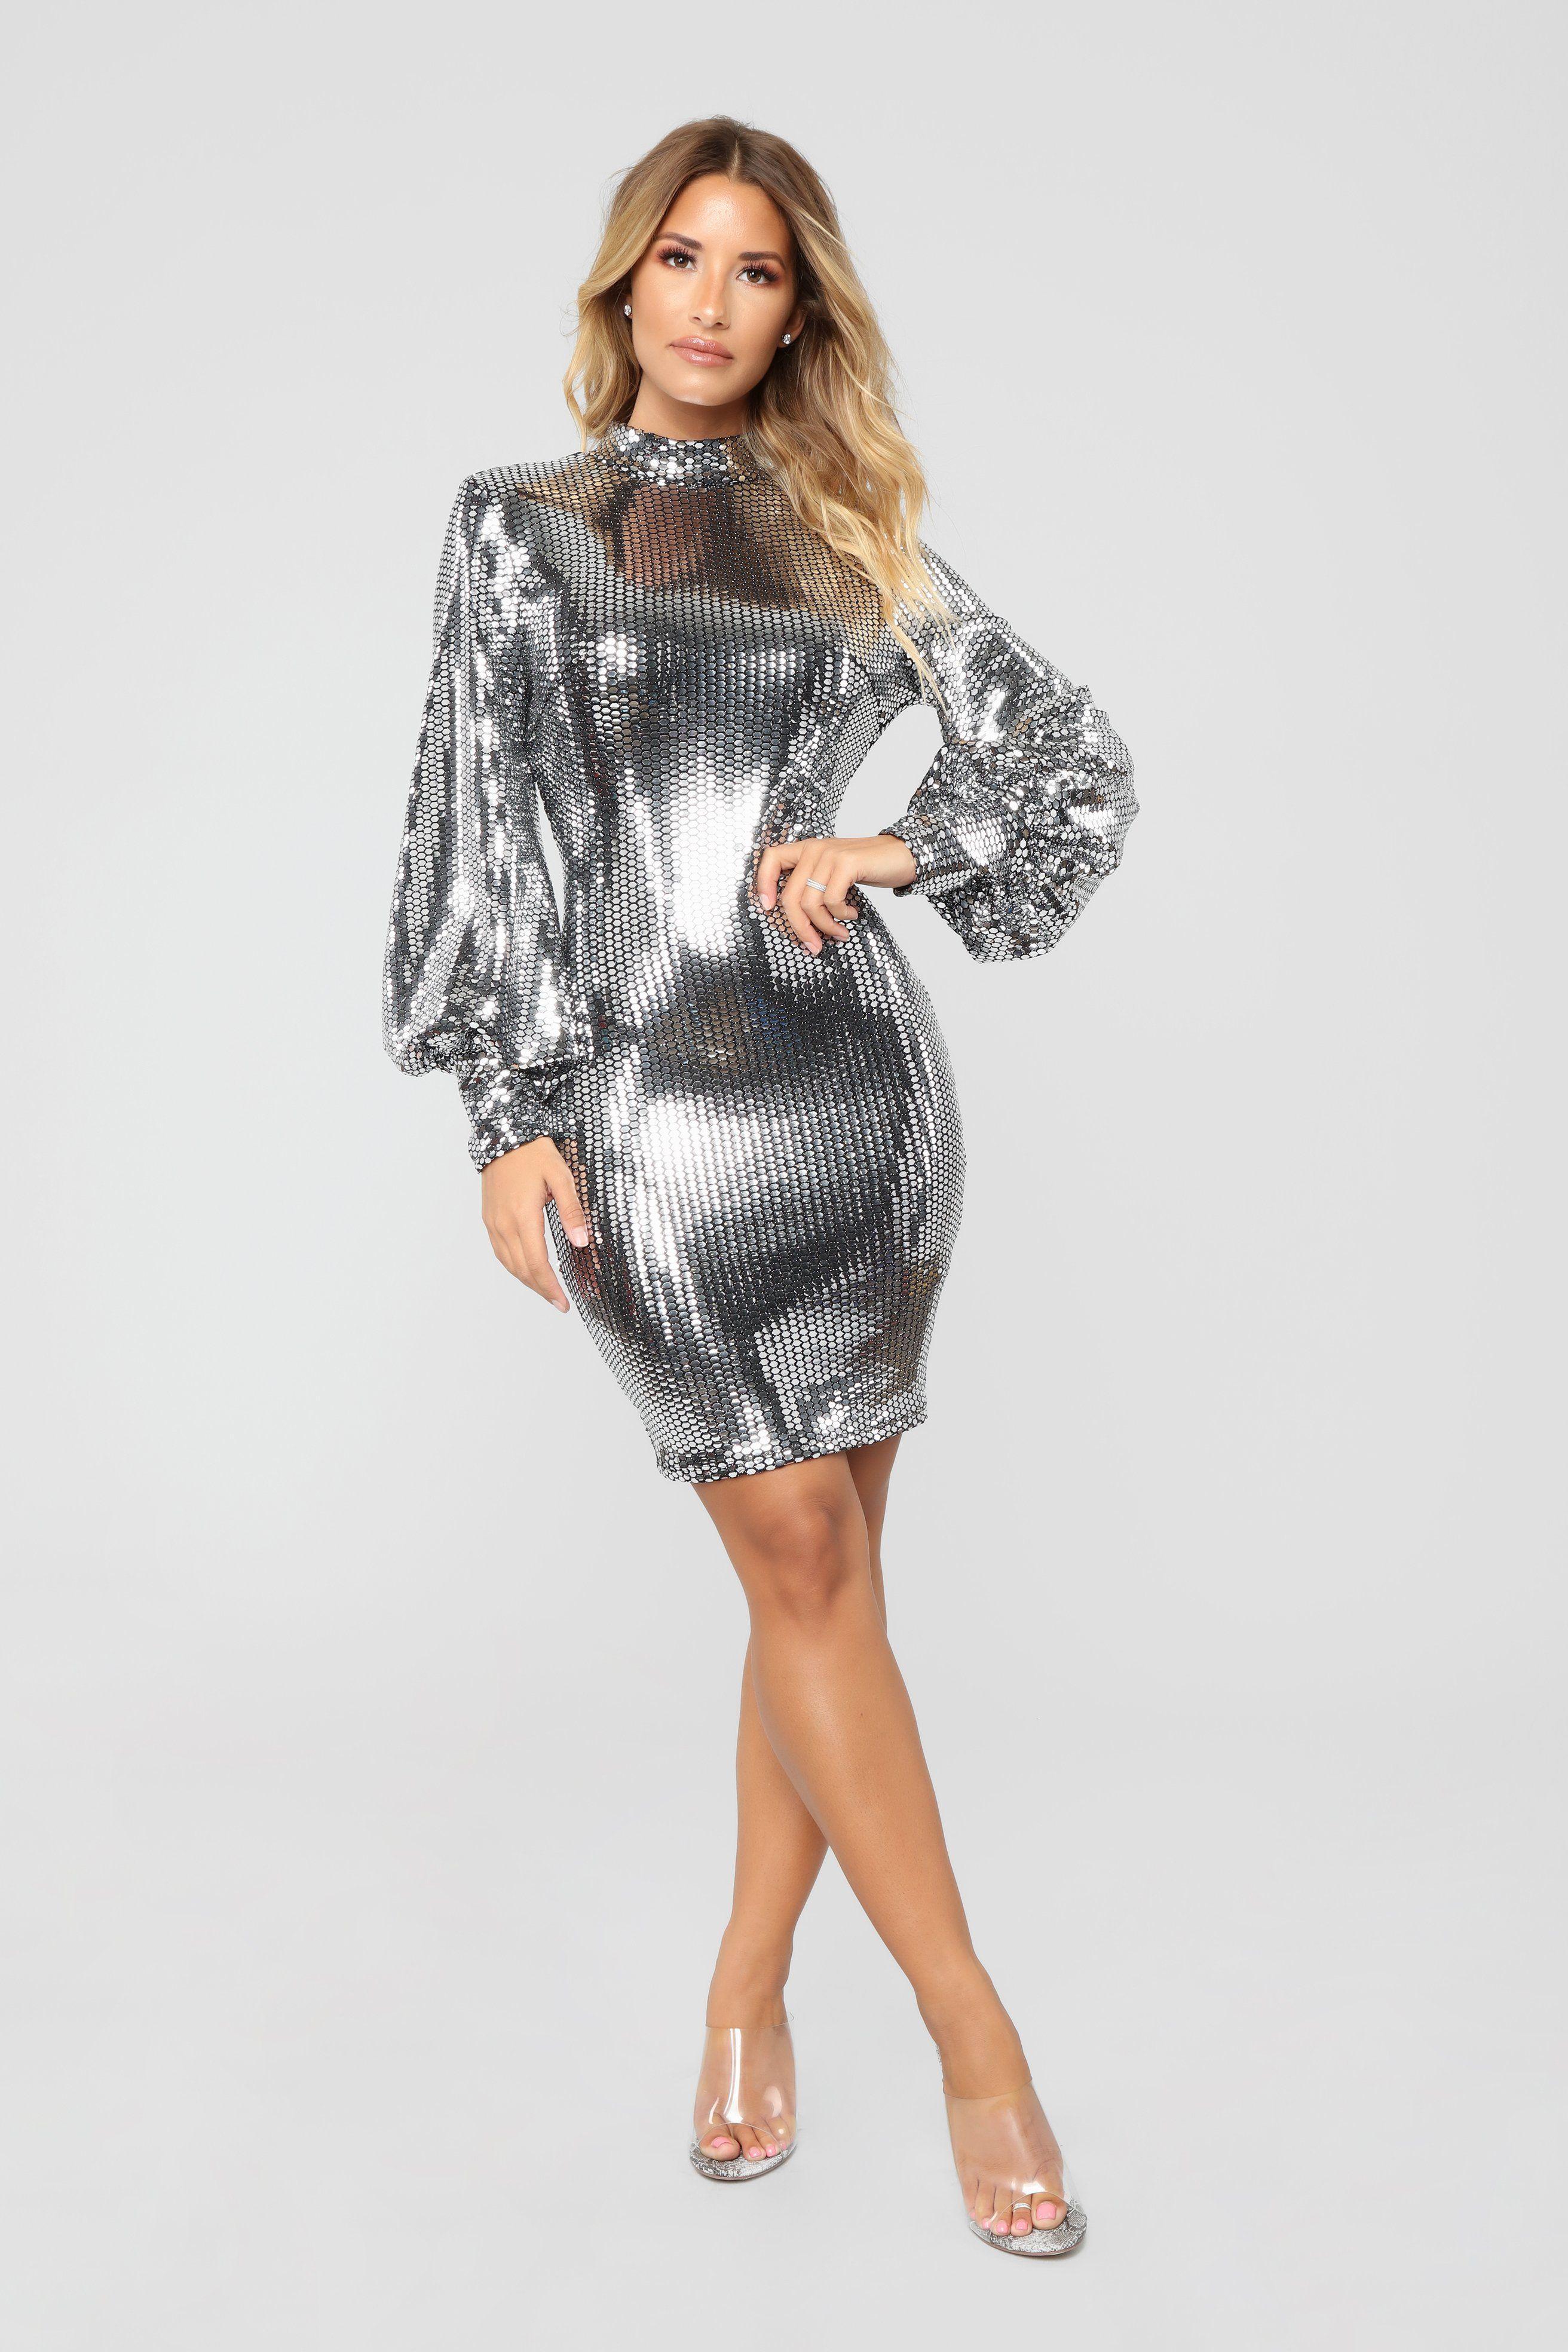 9320a3effb5 Under The Disco Ball Sequin Dress - Silver